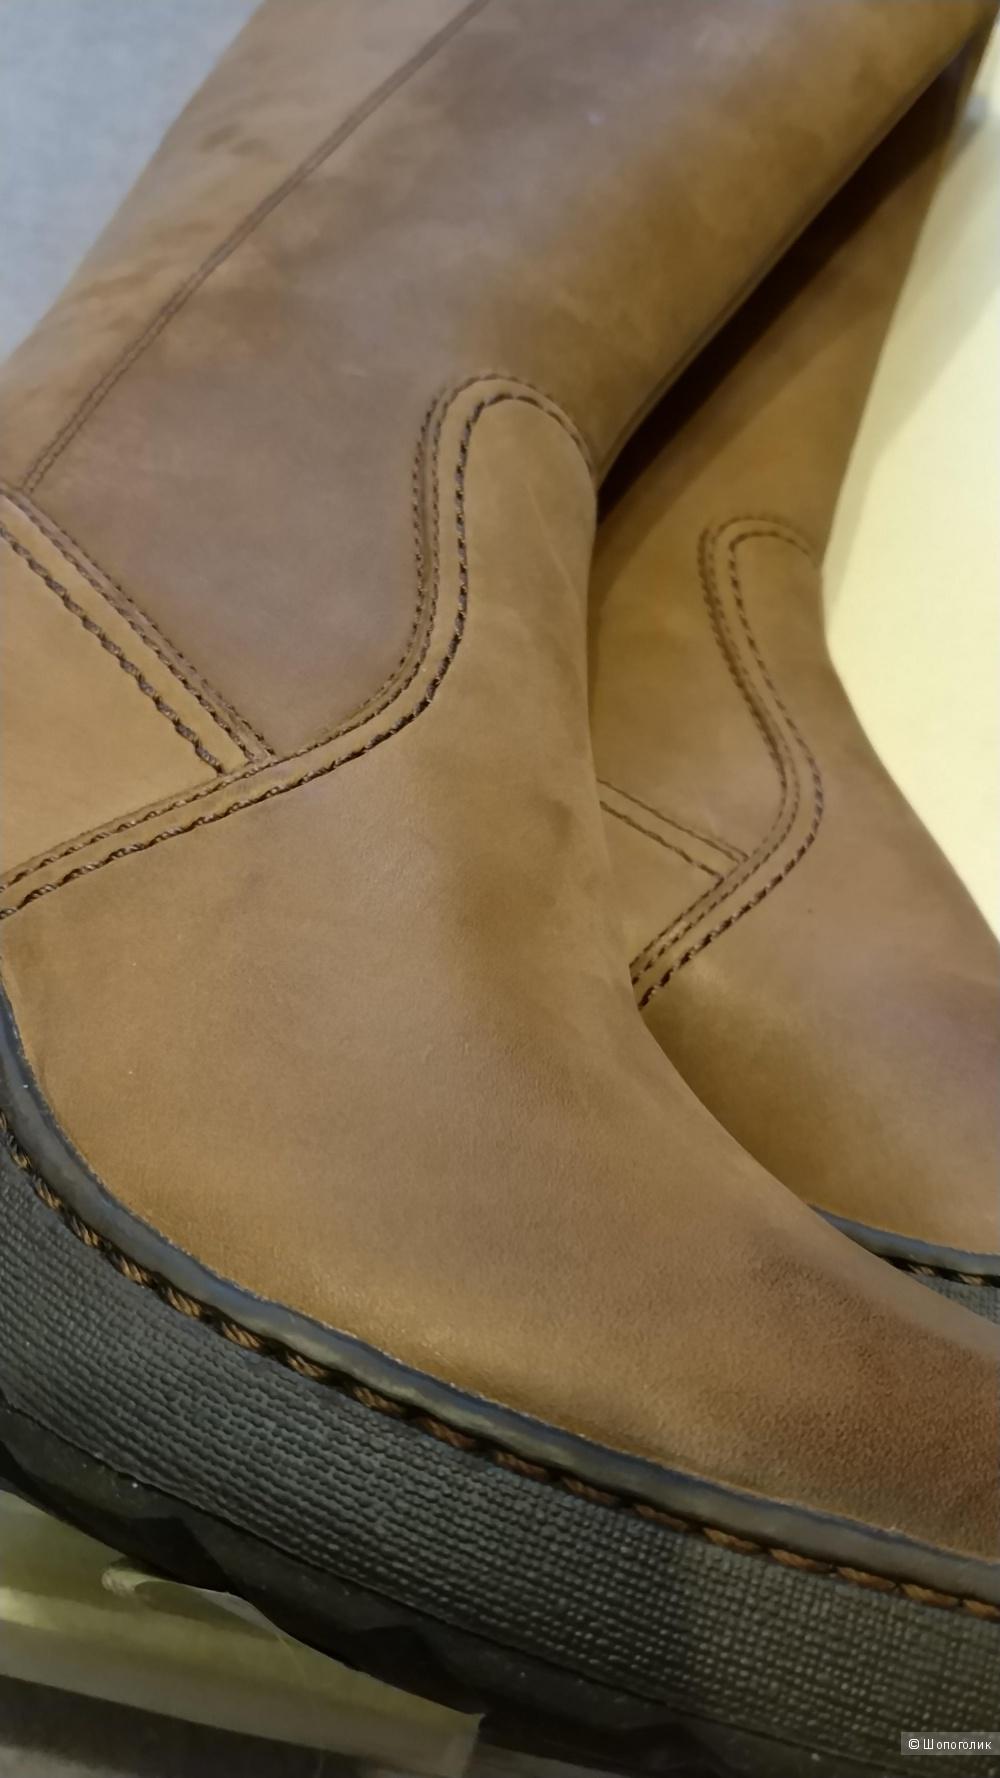 Сапоги Clarks размер 40 на 39-39,5